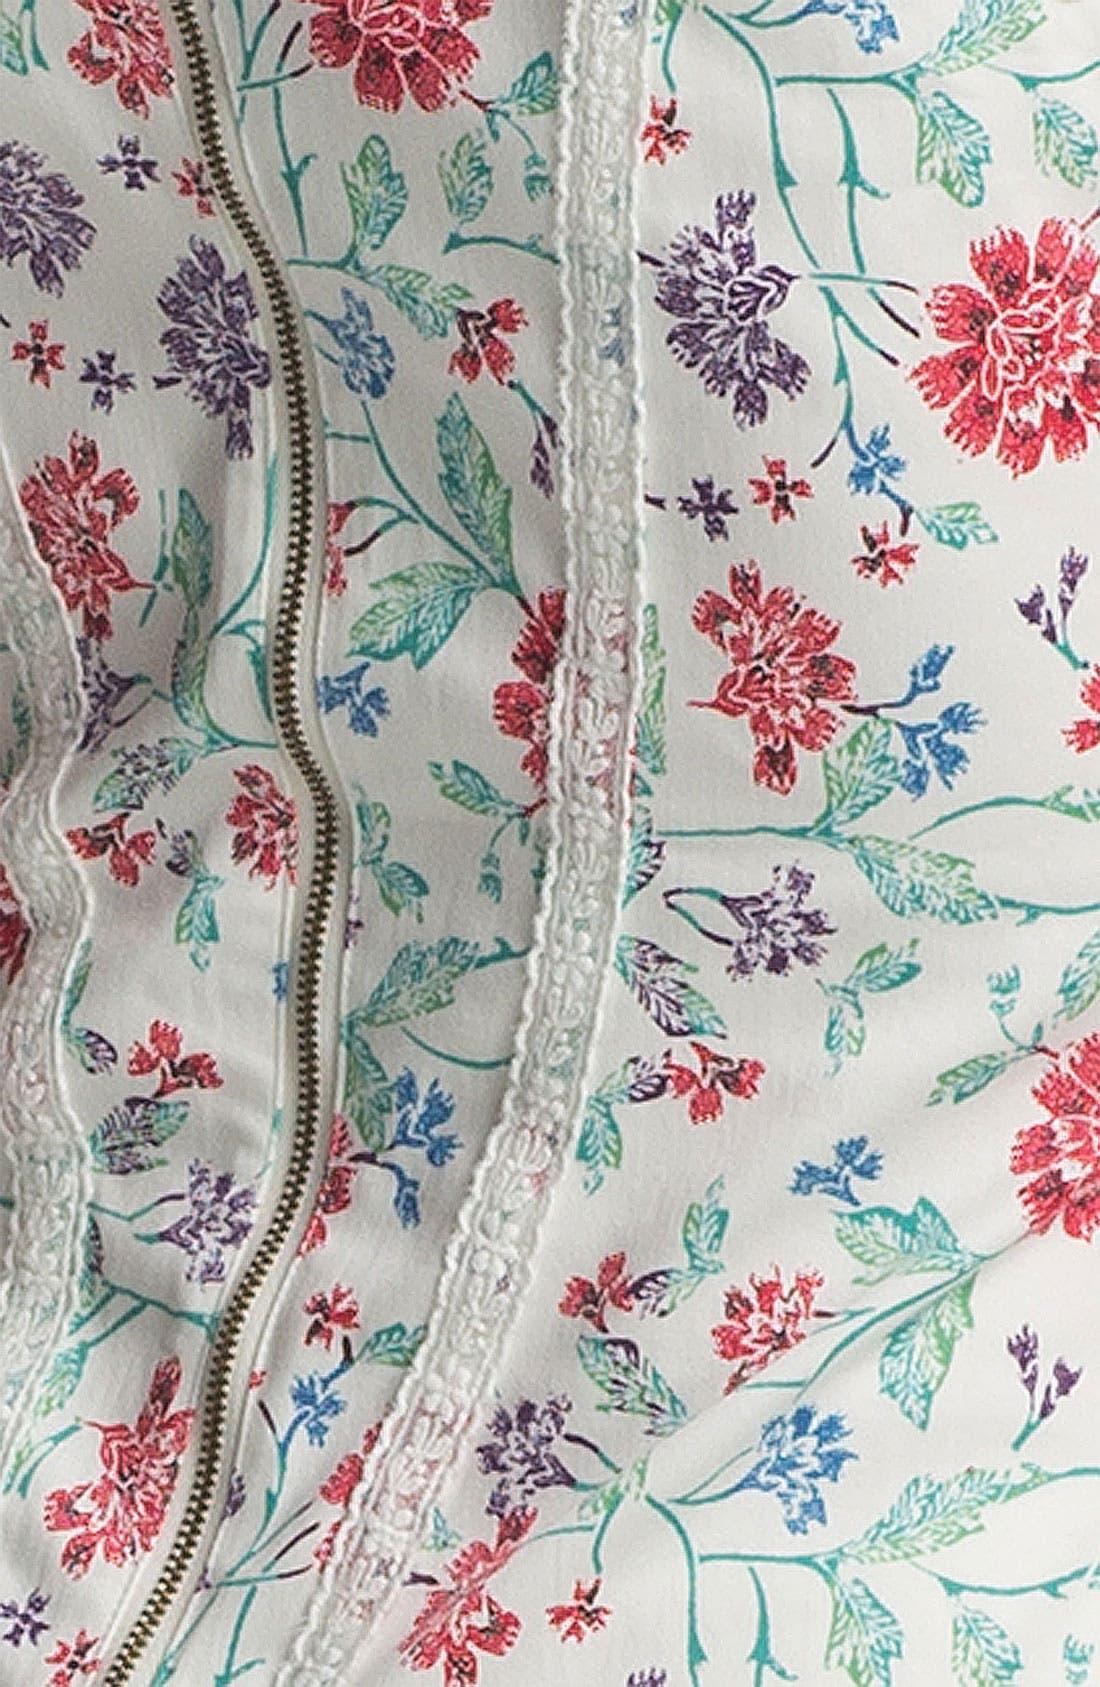 'Miss Lizzy' Floral Corset Camisole,                             Alternate thumbnail 3, color,                             900